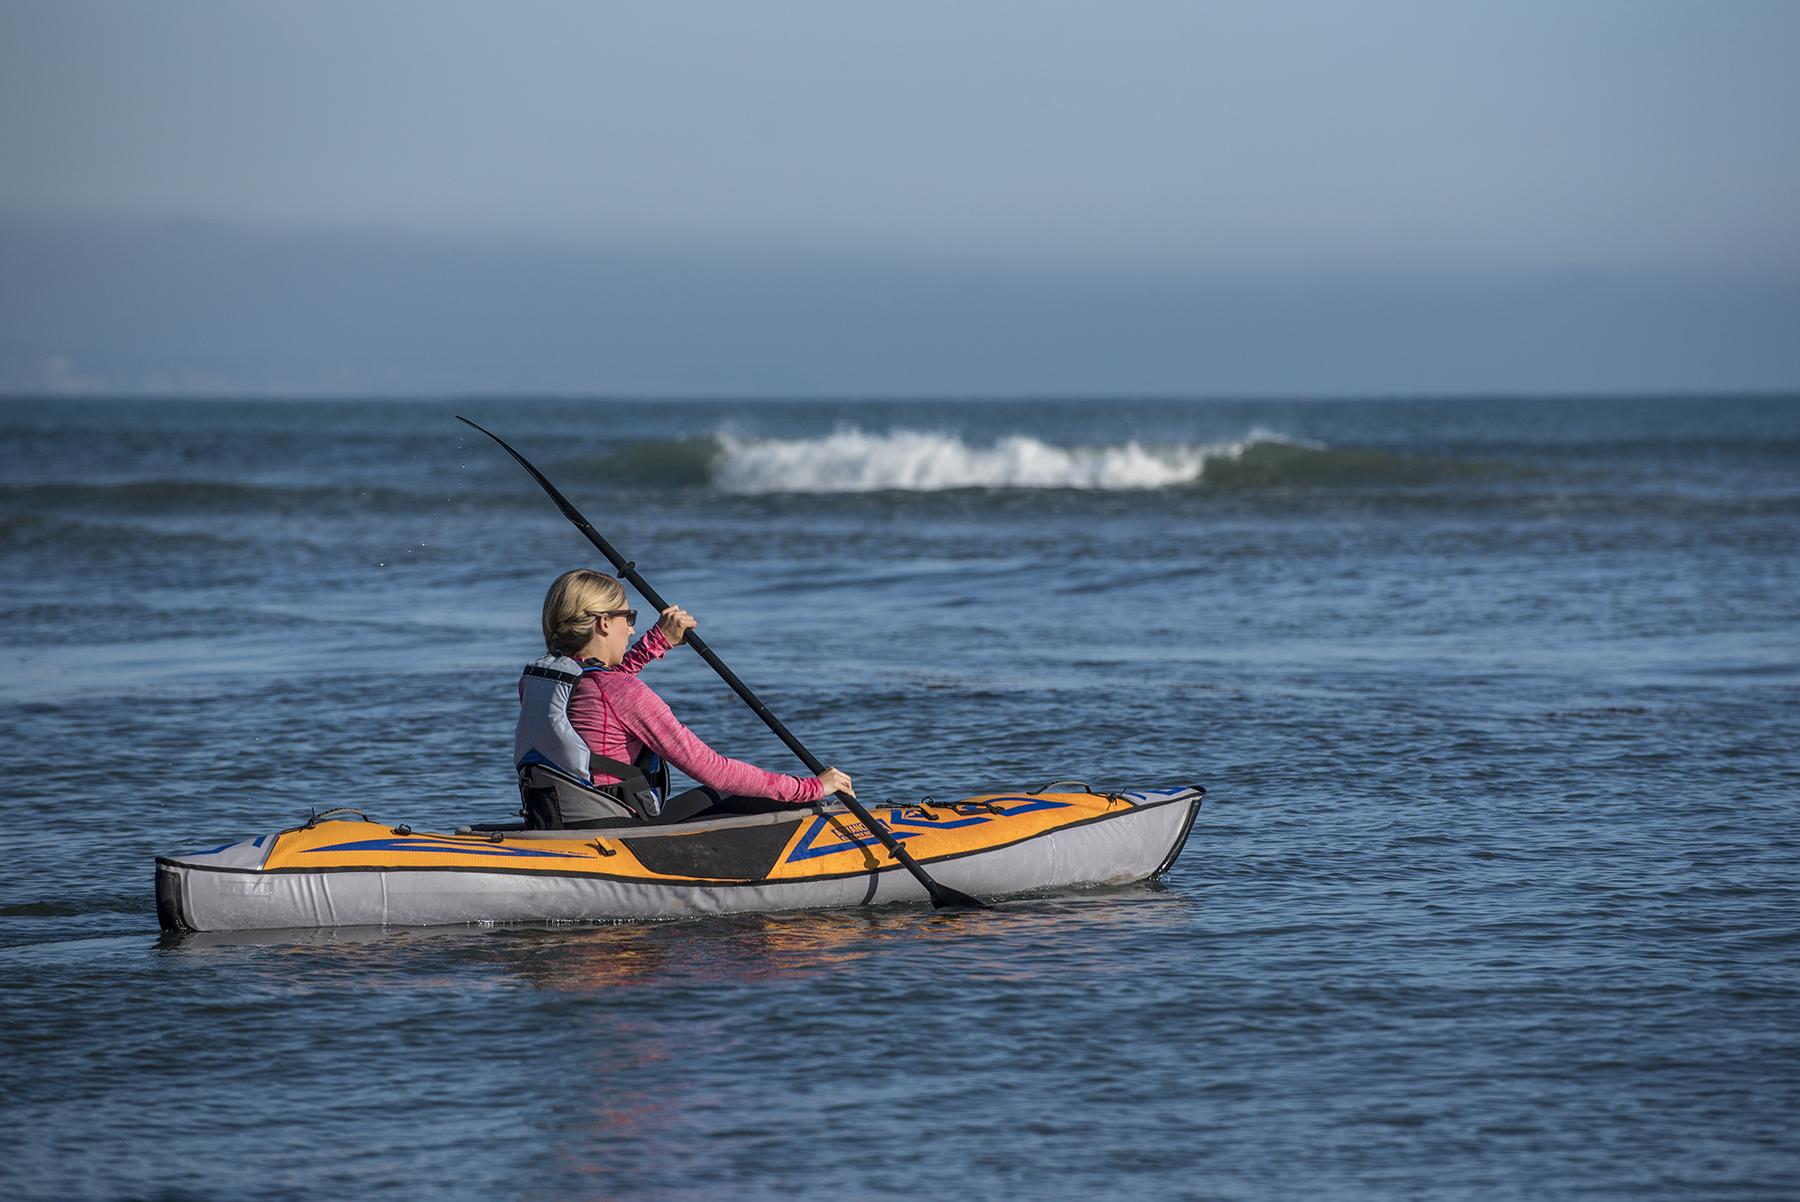 Kayaks: AdvancedFrame Sport by Advanced Elements - Image 2429